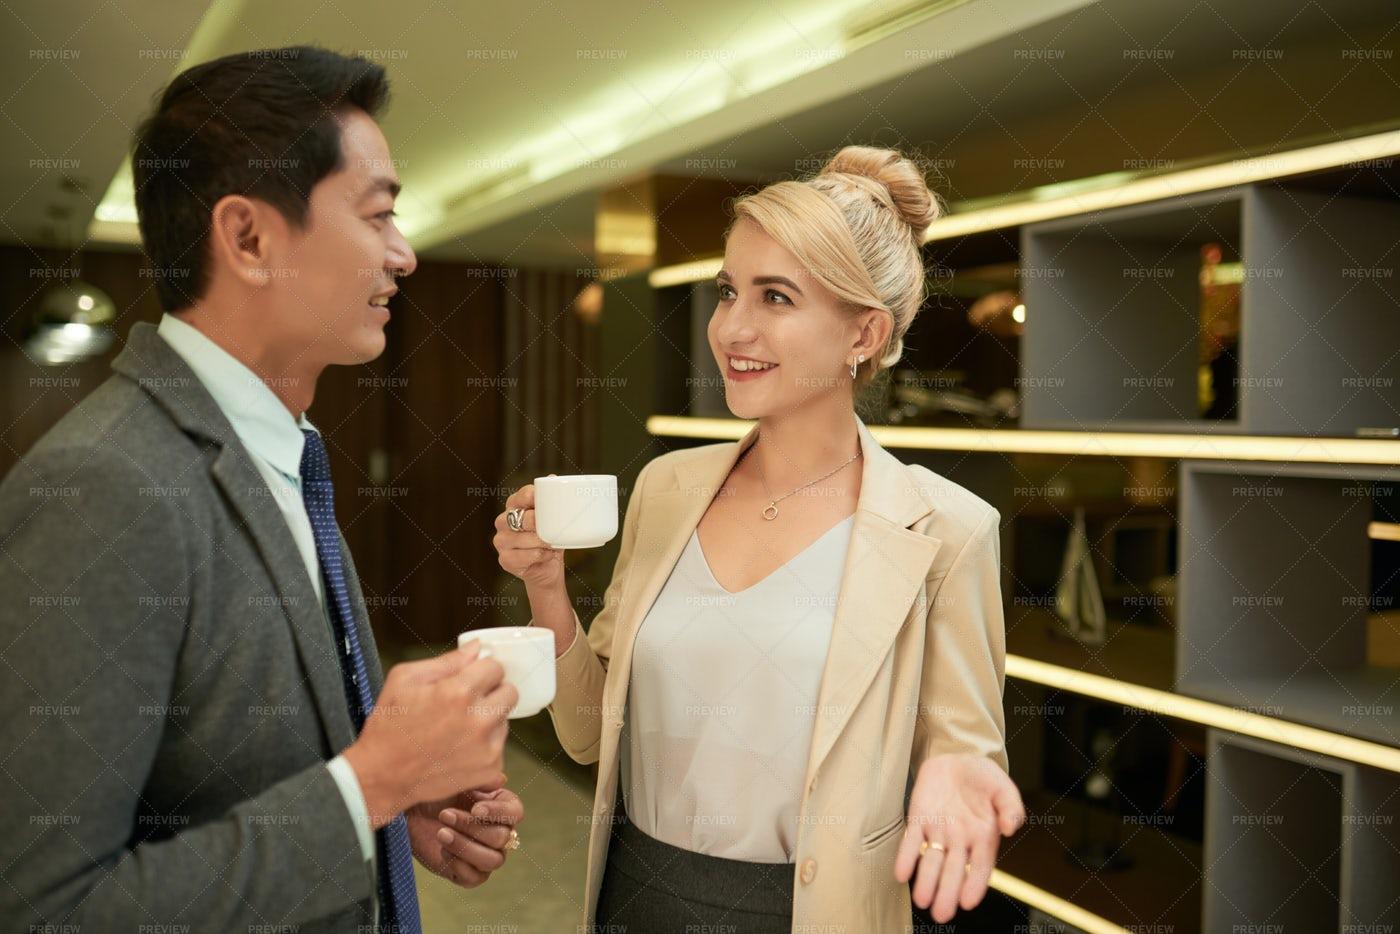 Talking Business Partners: Stock Photos